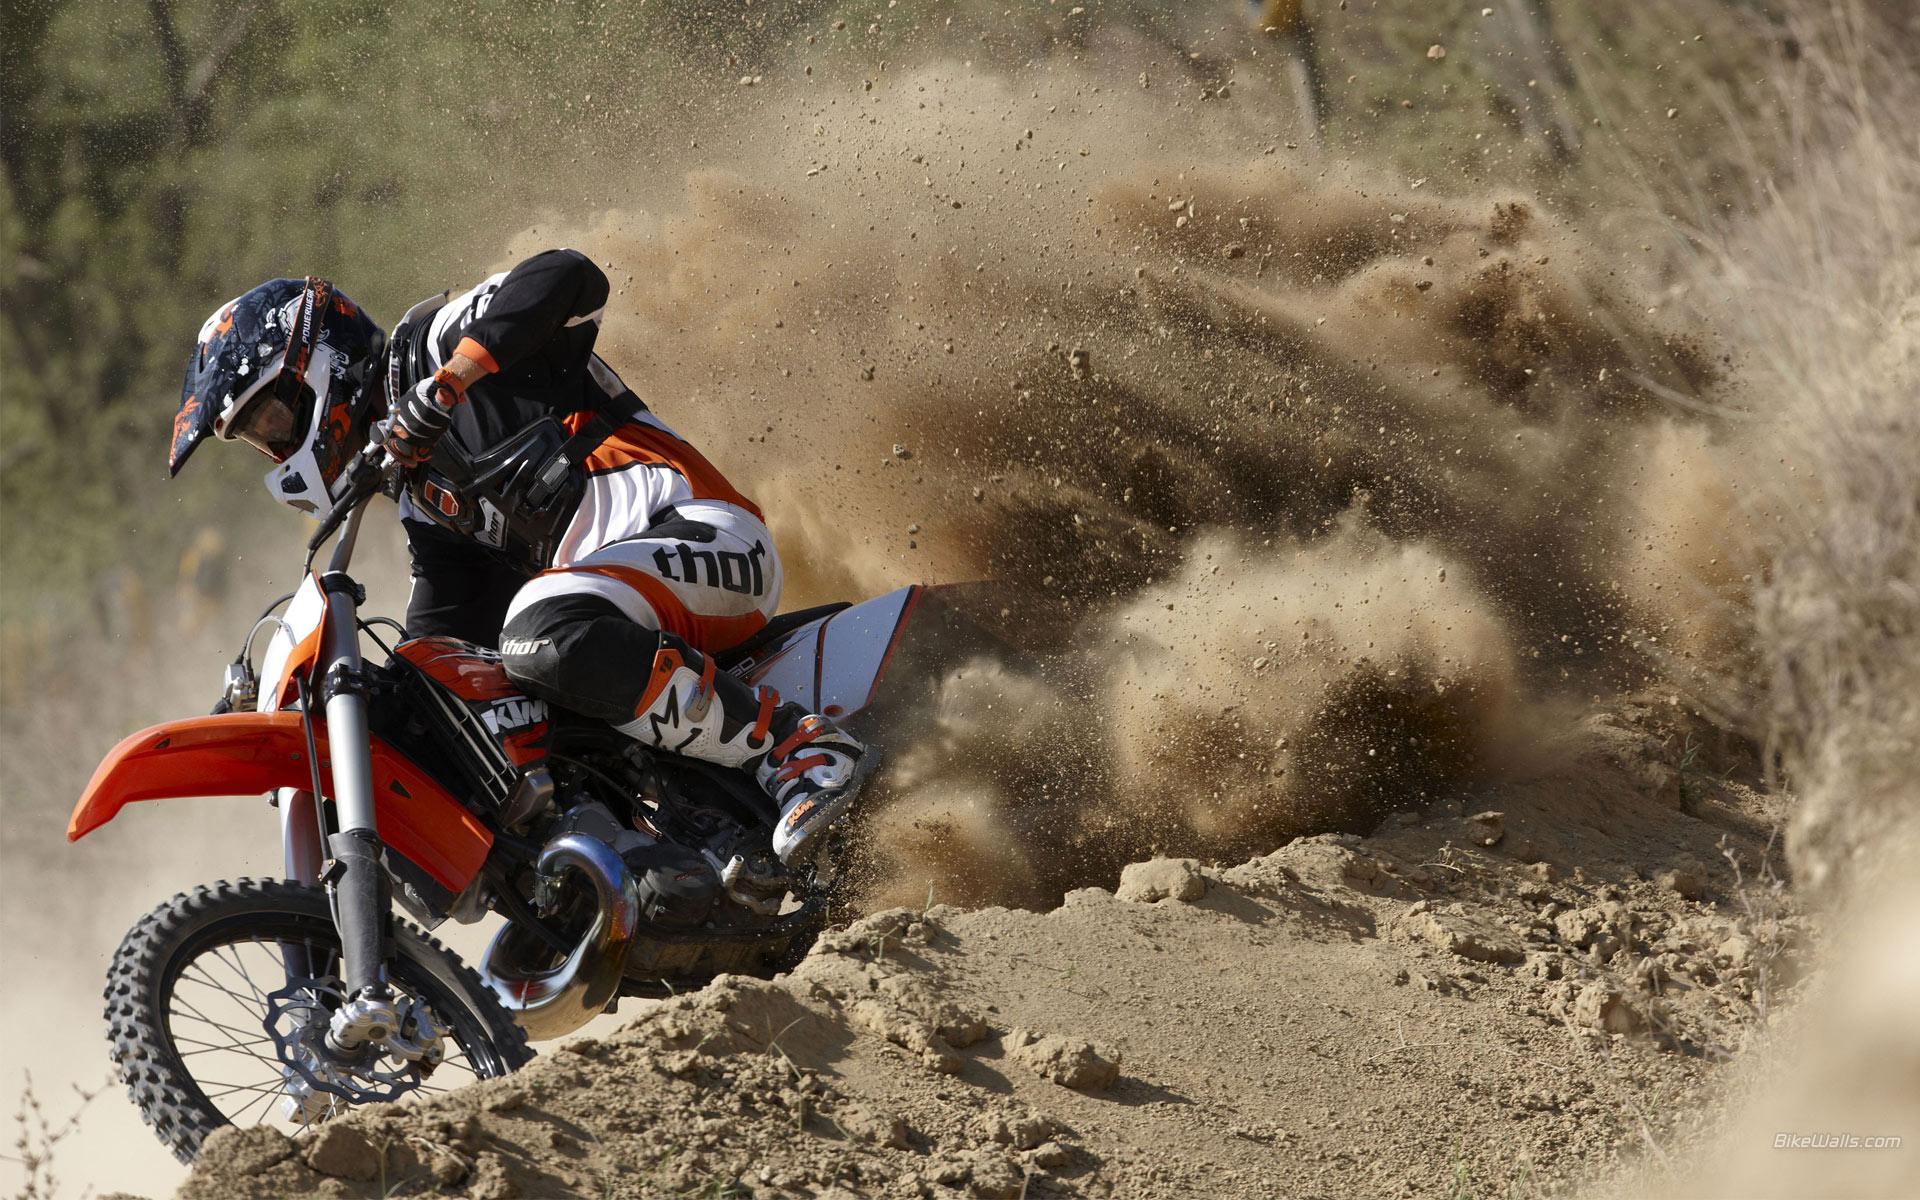 dirt dirt bikes motocross motorbikes racing KTM 250 wallpaper 1920x1200